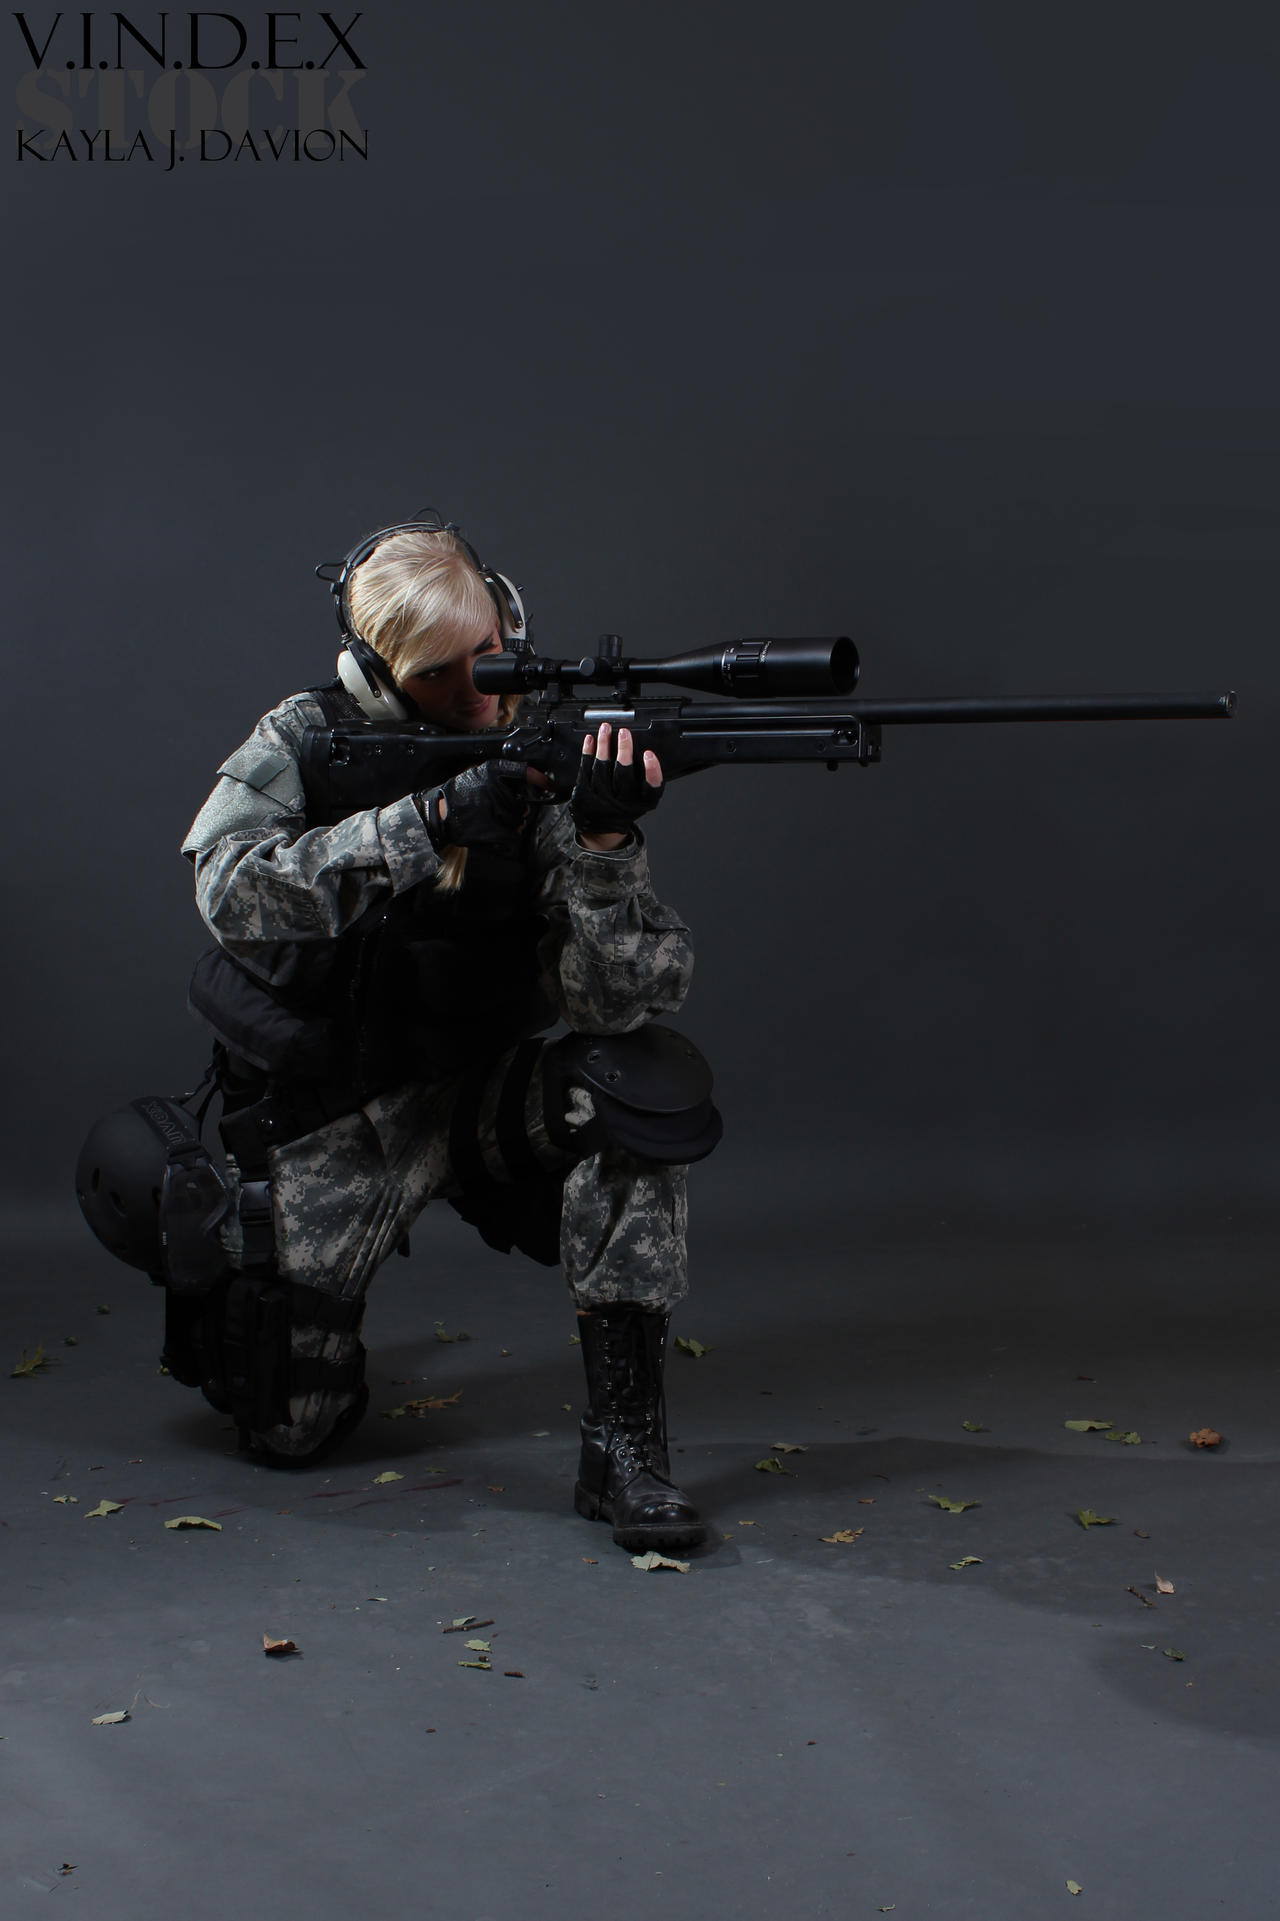 Female Sniper STOCK IV by PhelanDavion